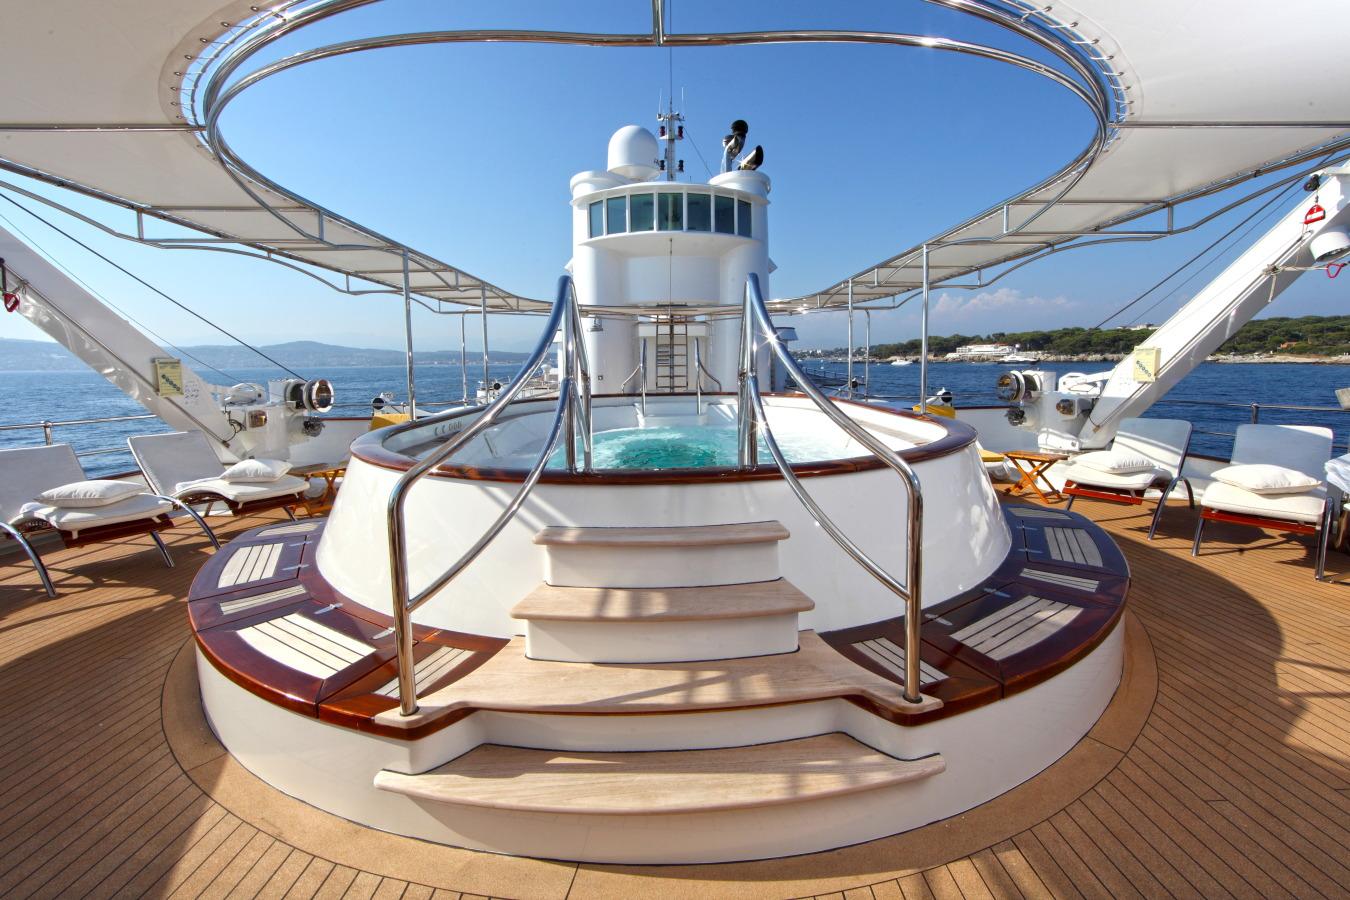 Yacht SHERAKHAN - Spa Pool